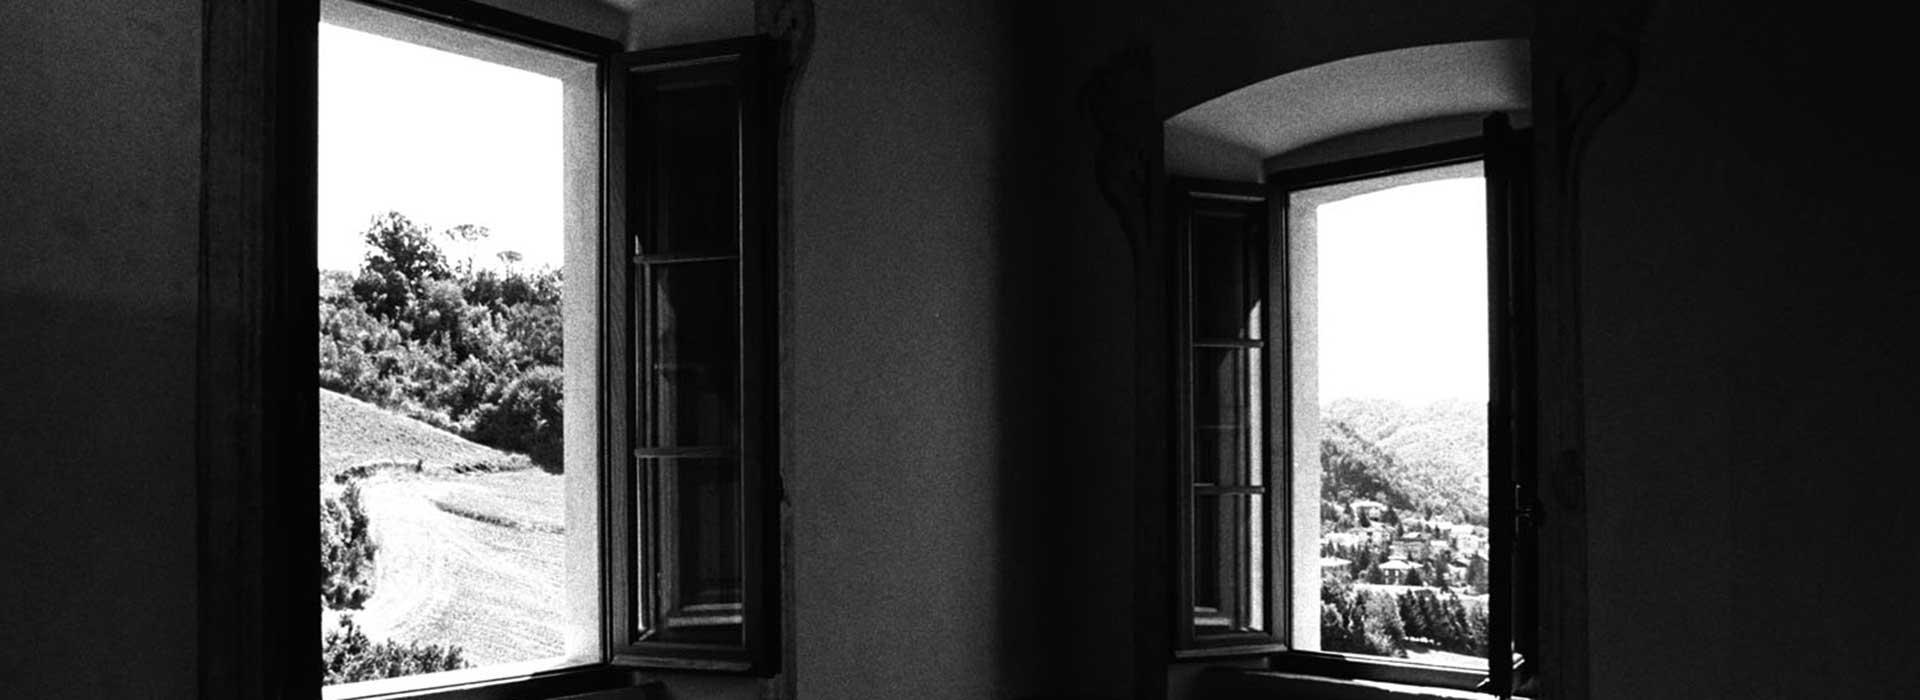 palazzo-valturio-vista-esterna-da-finestra